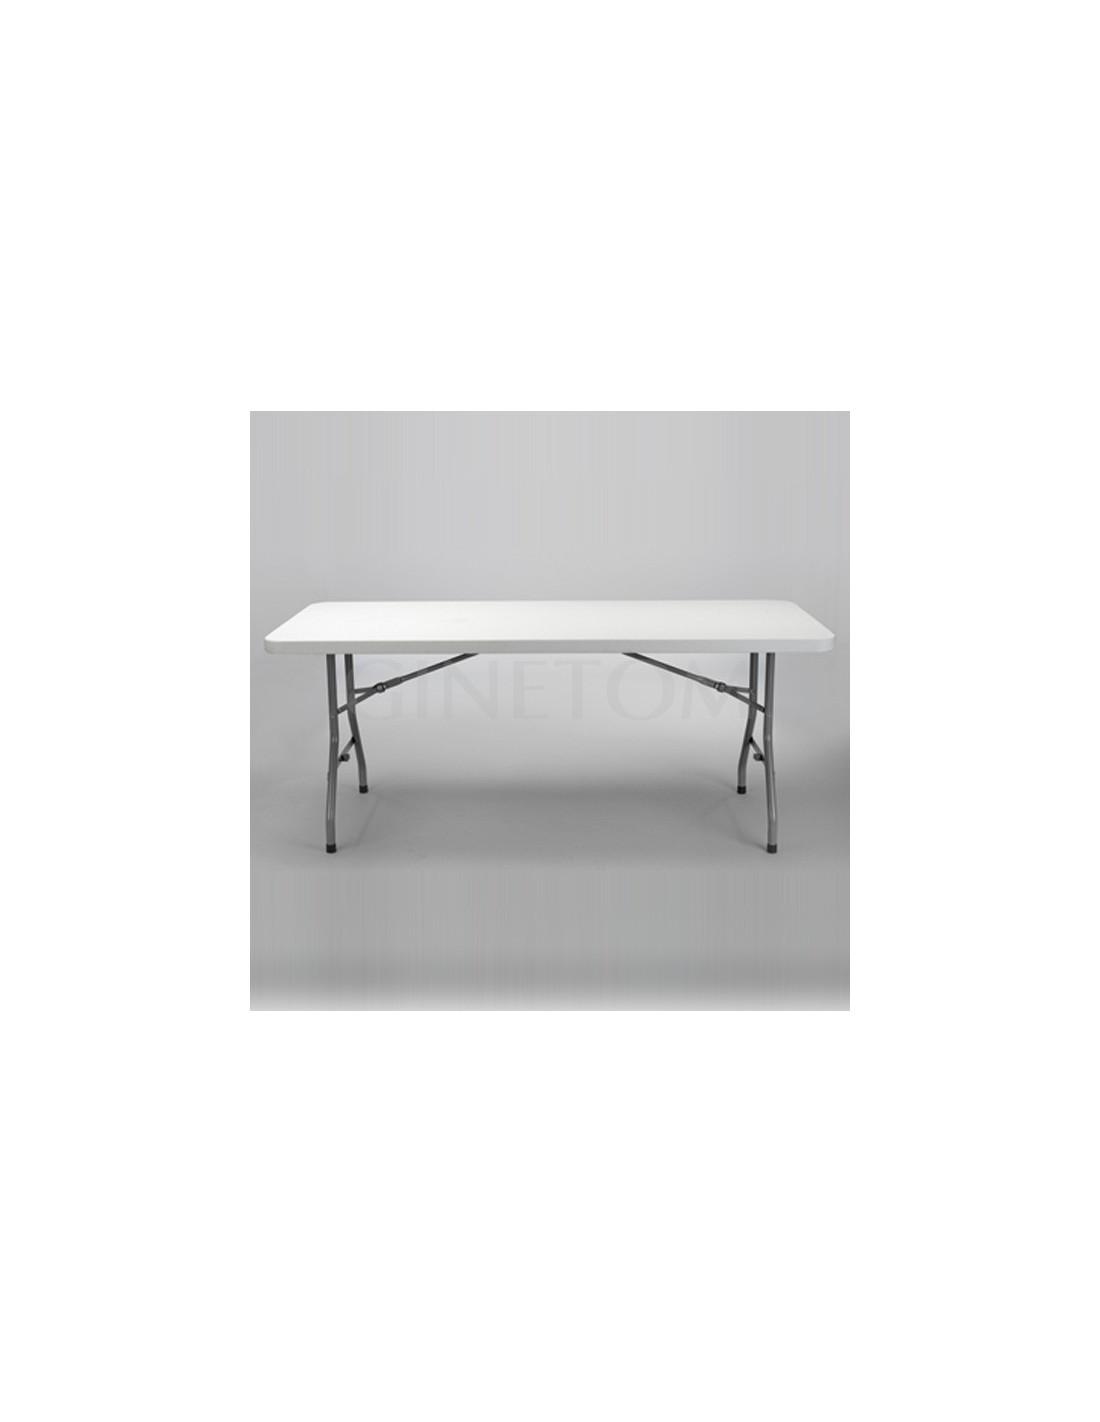 Mesas para catering rectangular ocho comensales for Mesa 2 metros comensales